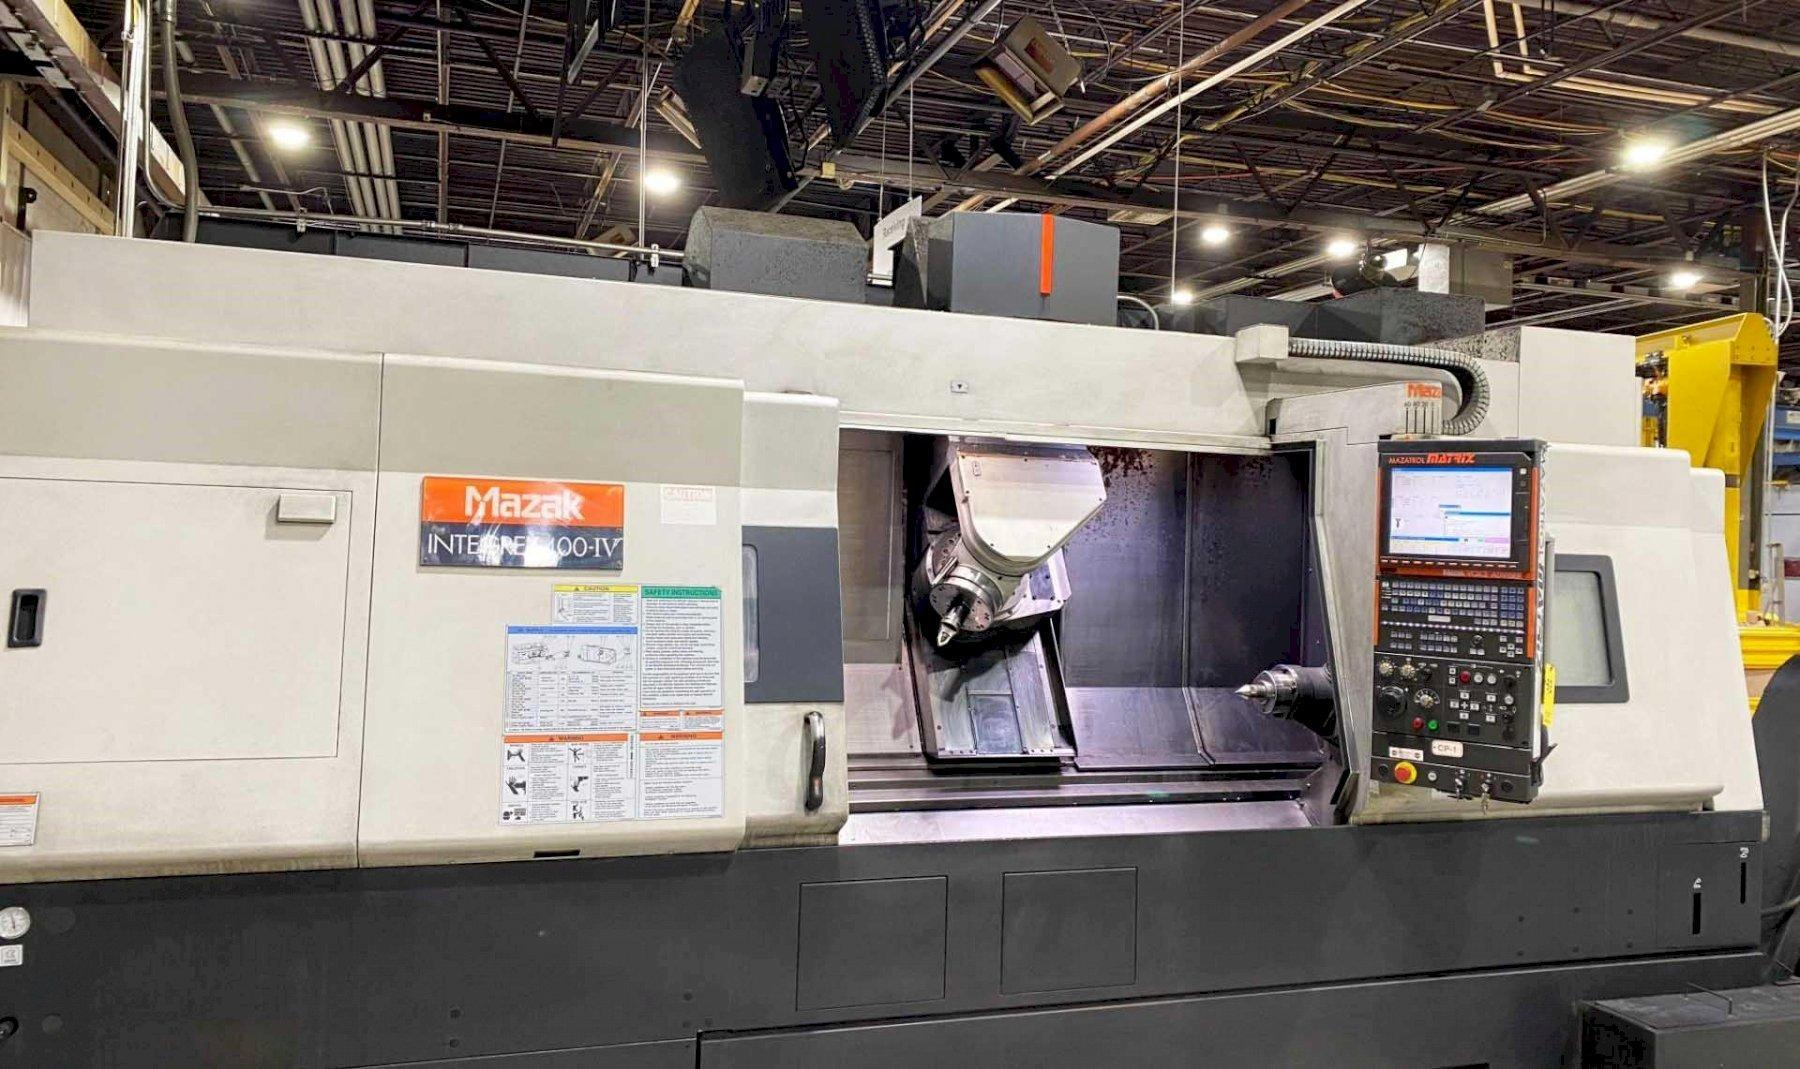 Mazak Integrex 400-IV Multi-Tasking CNC Turning Center 2007 with Mazatrol Matrix CNC Control, Live Milling, 5-Axis, Tailstock, Coolant Thru Spindle, and Chip Conveyor.